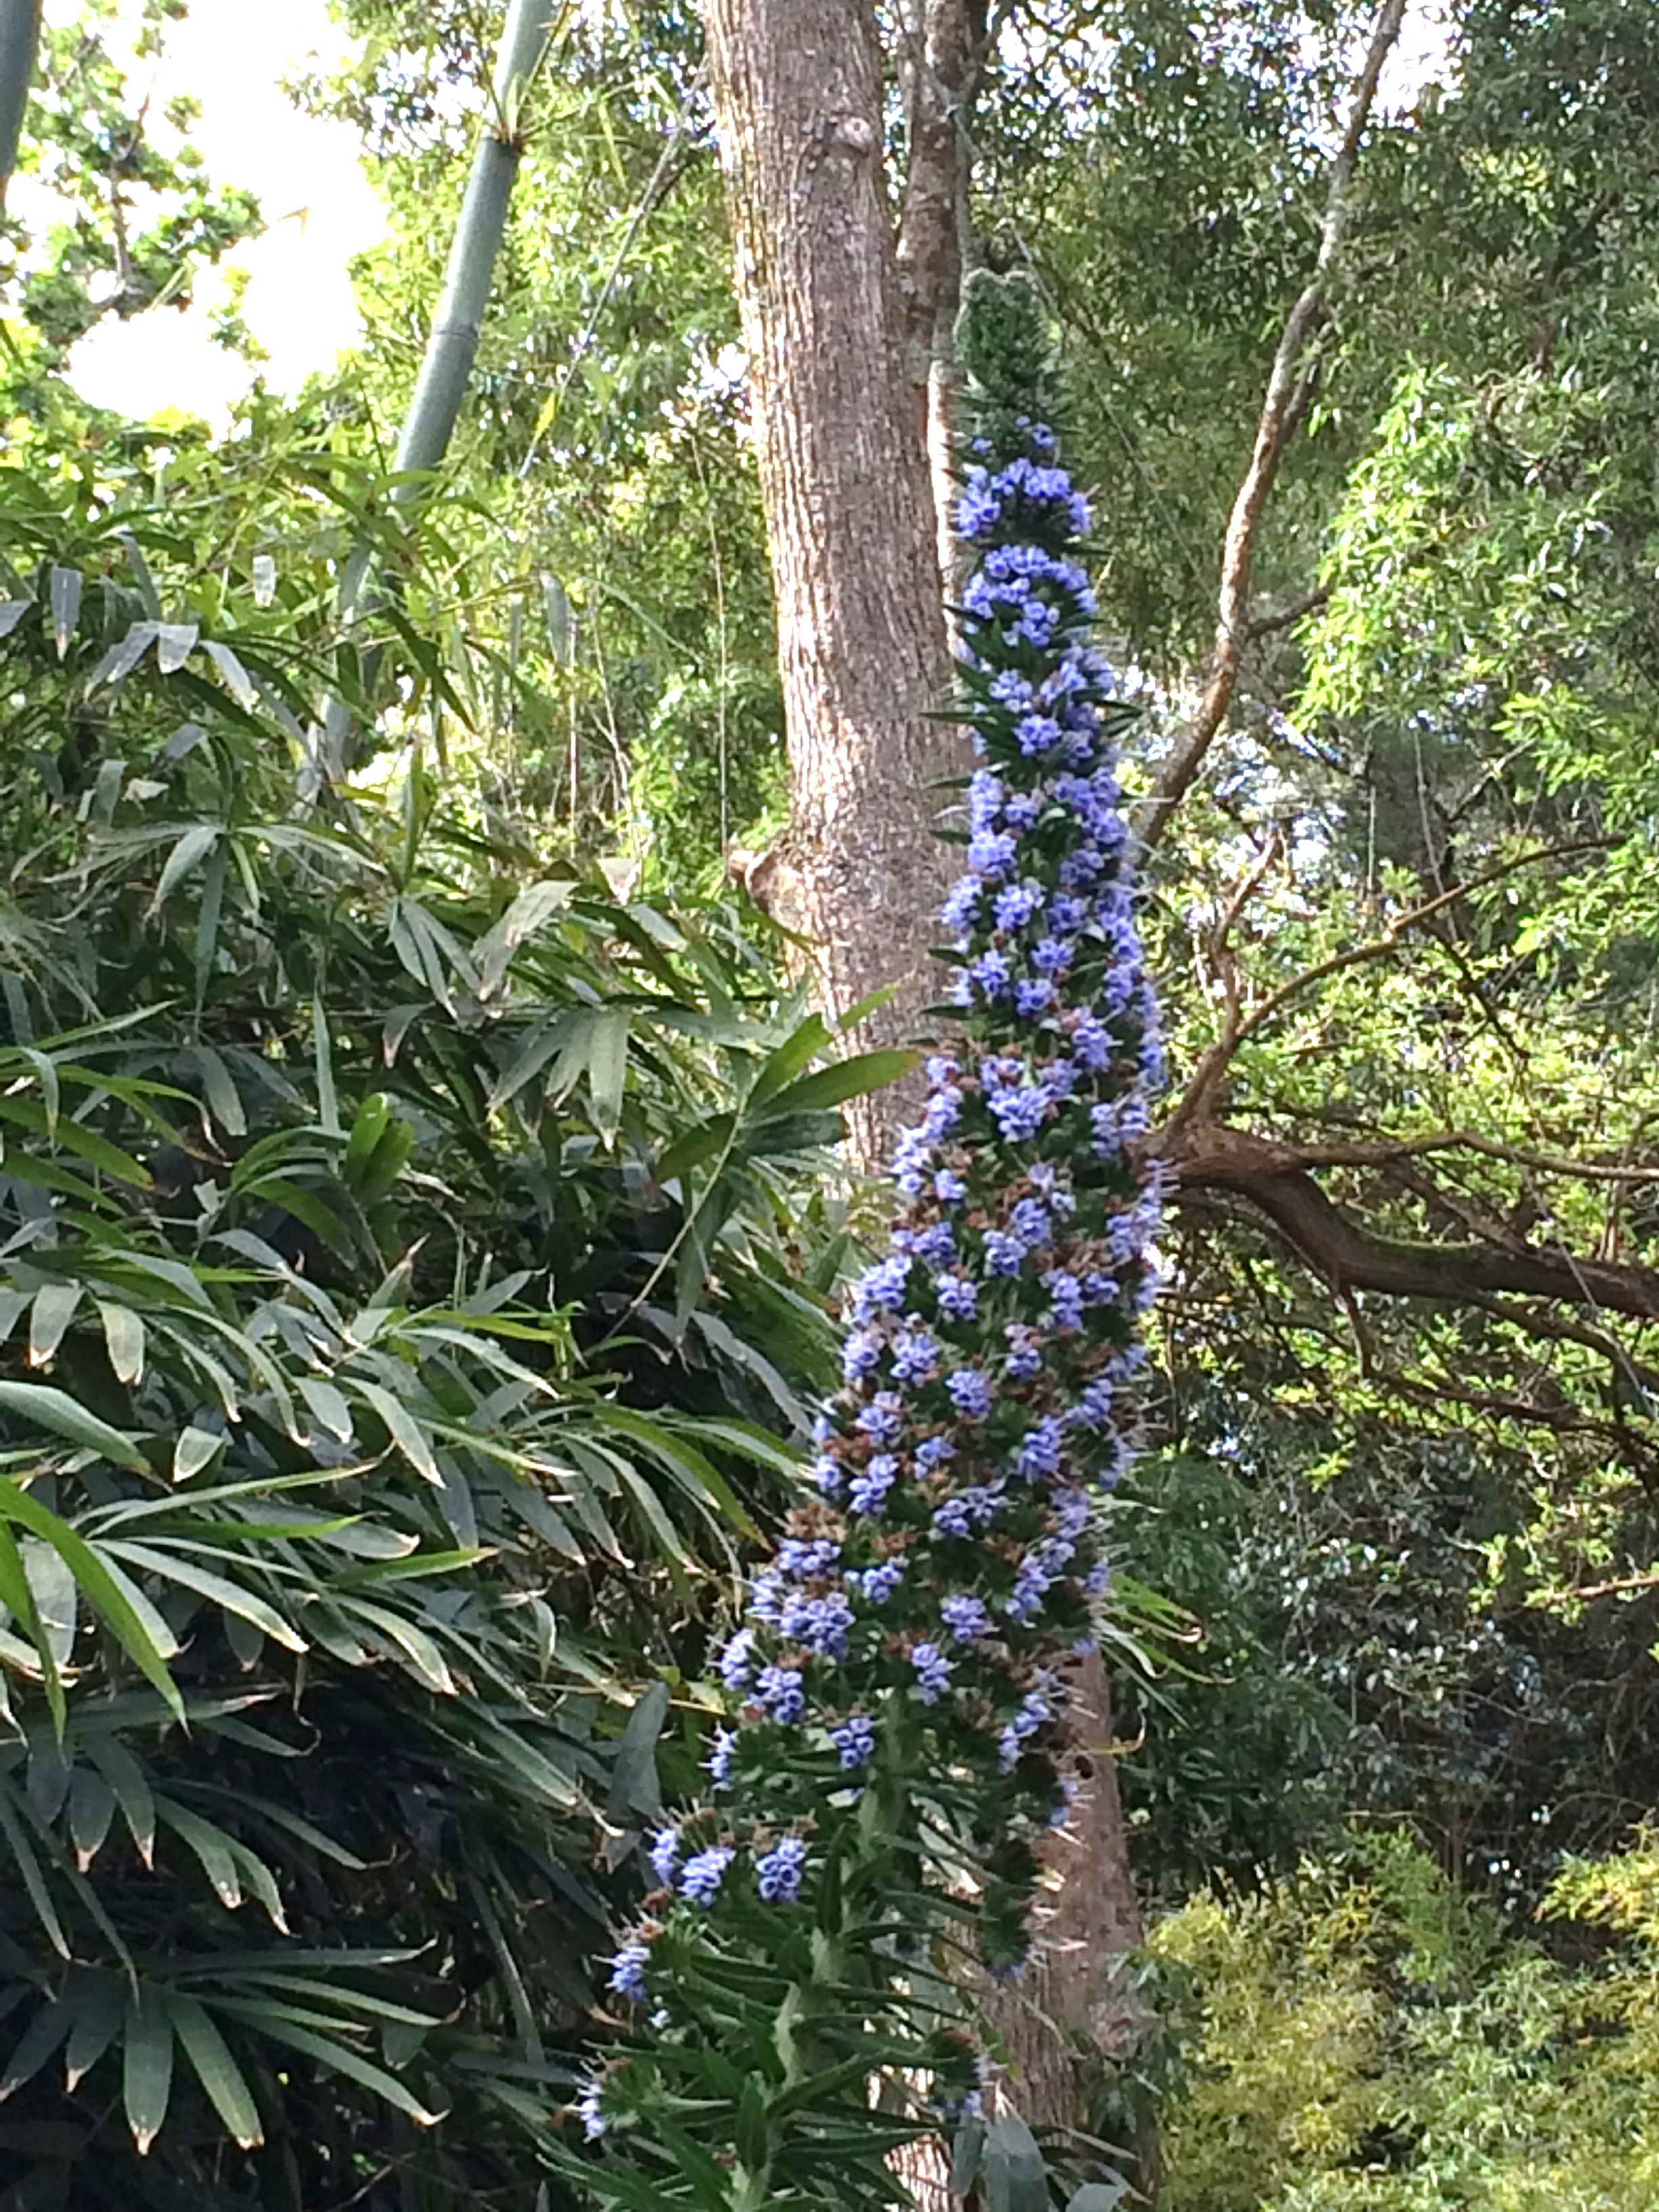 Echium candicans x pininana-24.03.17-1n (2).JPG